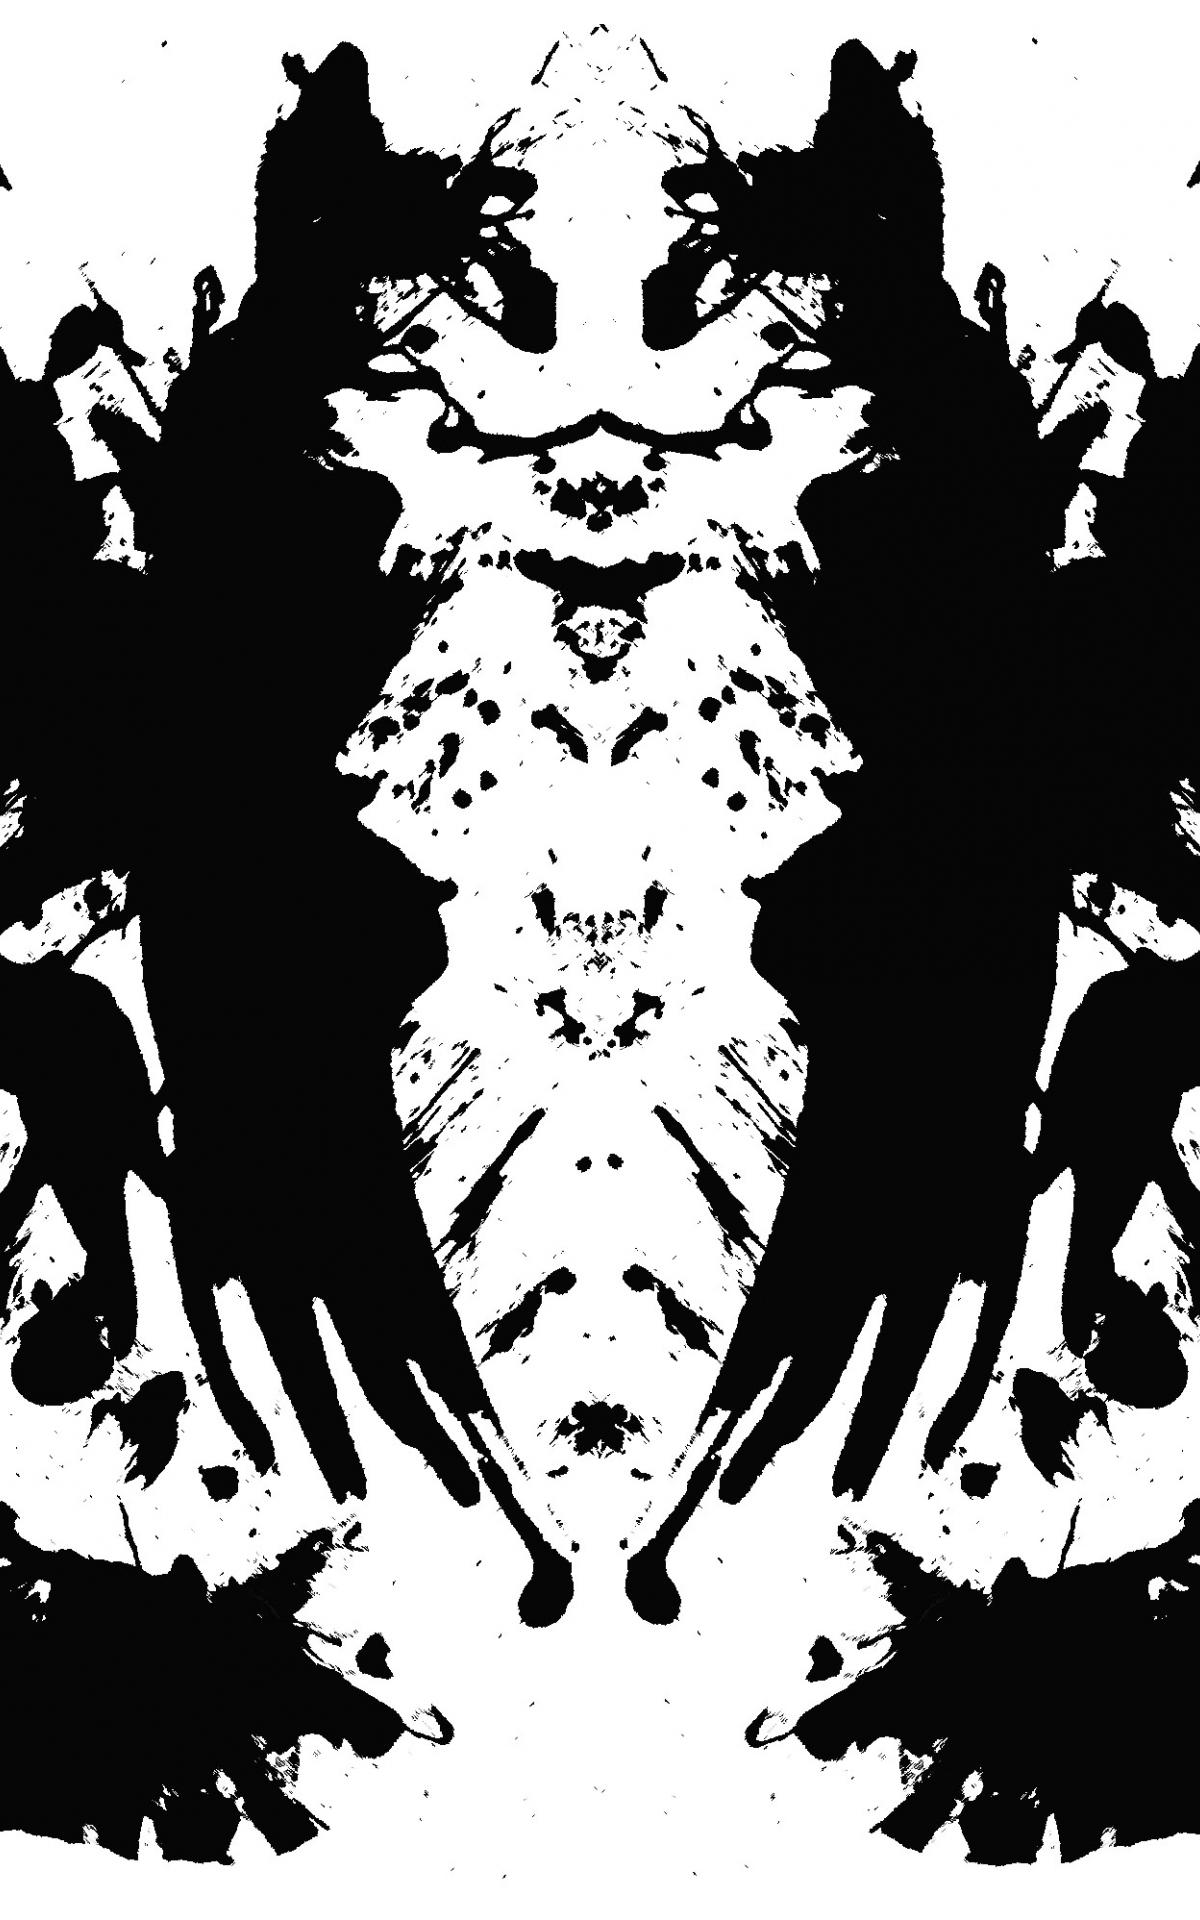 Free Download Rorschach Test Wallpaper 1935x1997 Rorschach Test 1935x1997 For Your Desktop Mobile Tablet Explore 77 Rorschach Wallpaper Watchmen Wallpaper Watchmen Rorschach Wallpaper